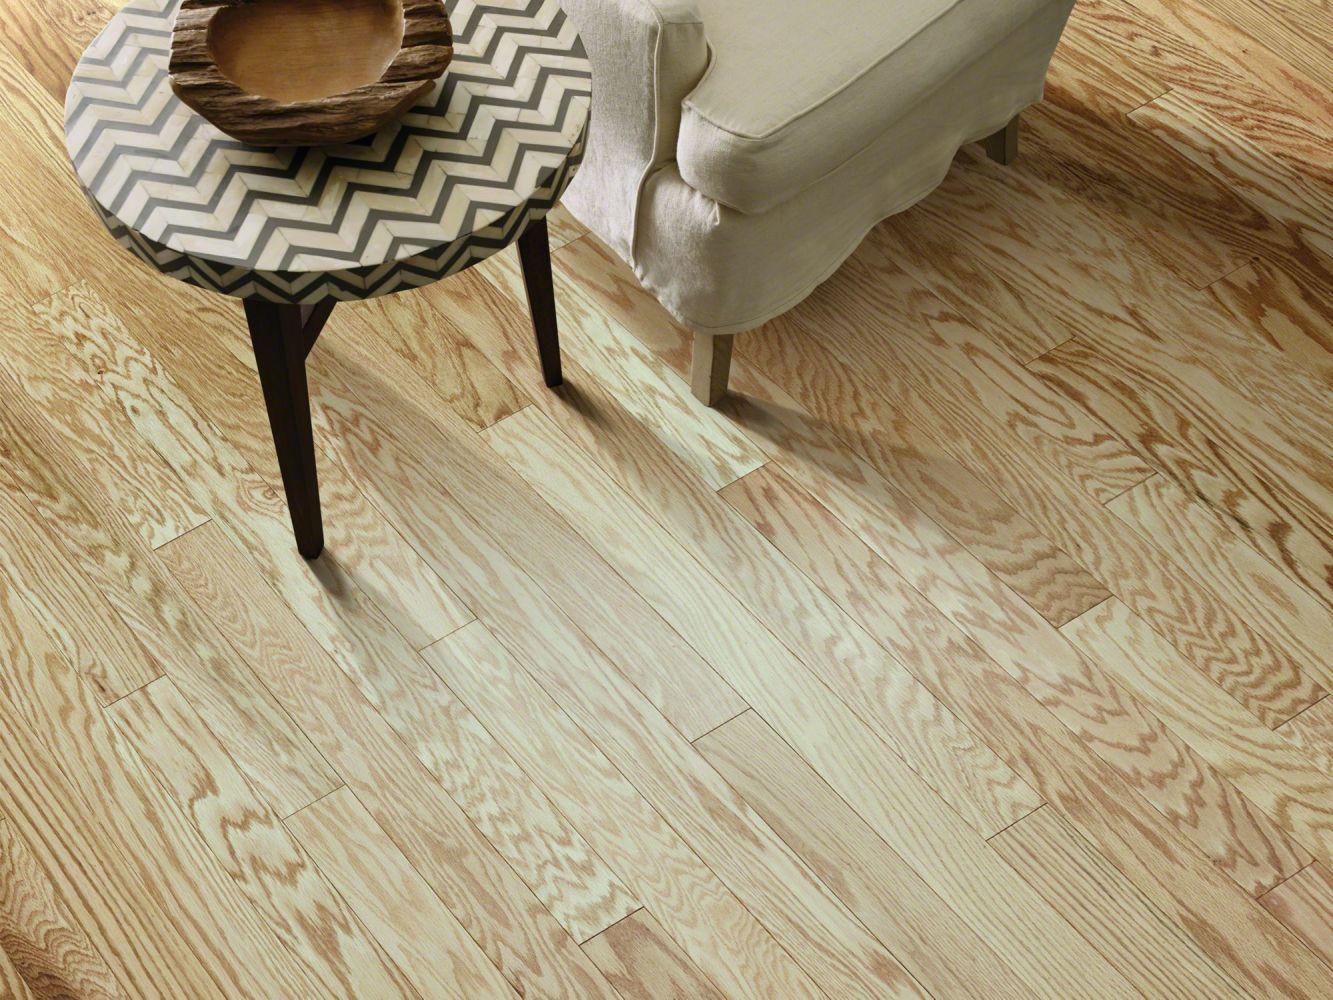 Shaw Floors Home Fn Gold Hardwood Rhapsody 5 Red Oak Natural 00774_HW675